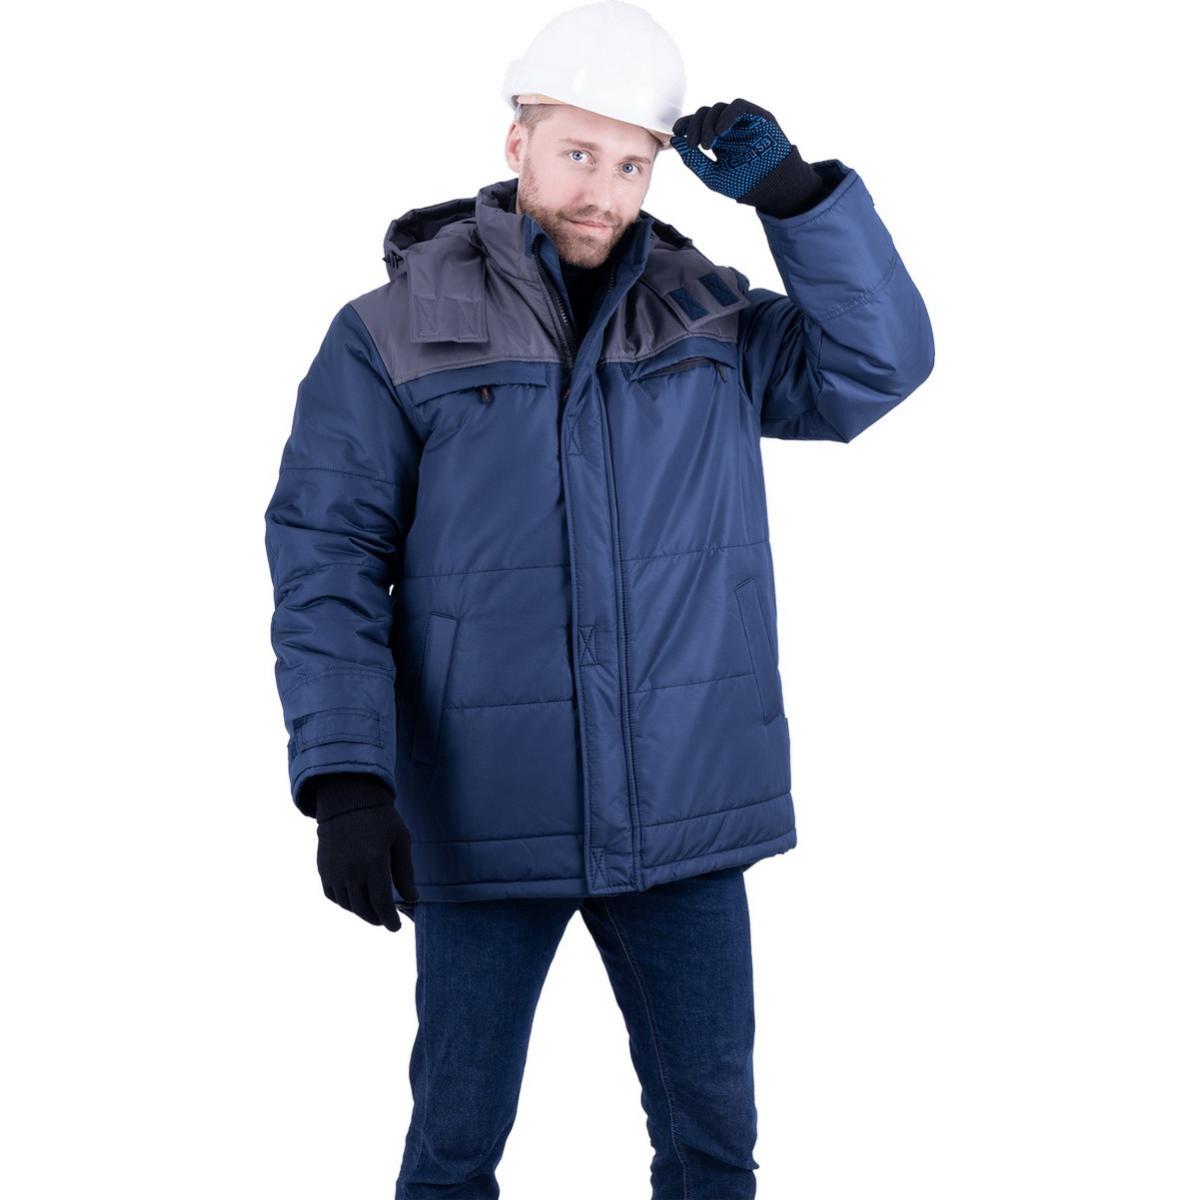 Куртка ШАТЛ утепленная  т/синий-серый (разм. 104-108 рост 170-176)